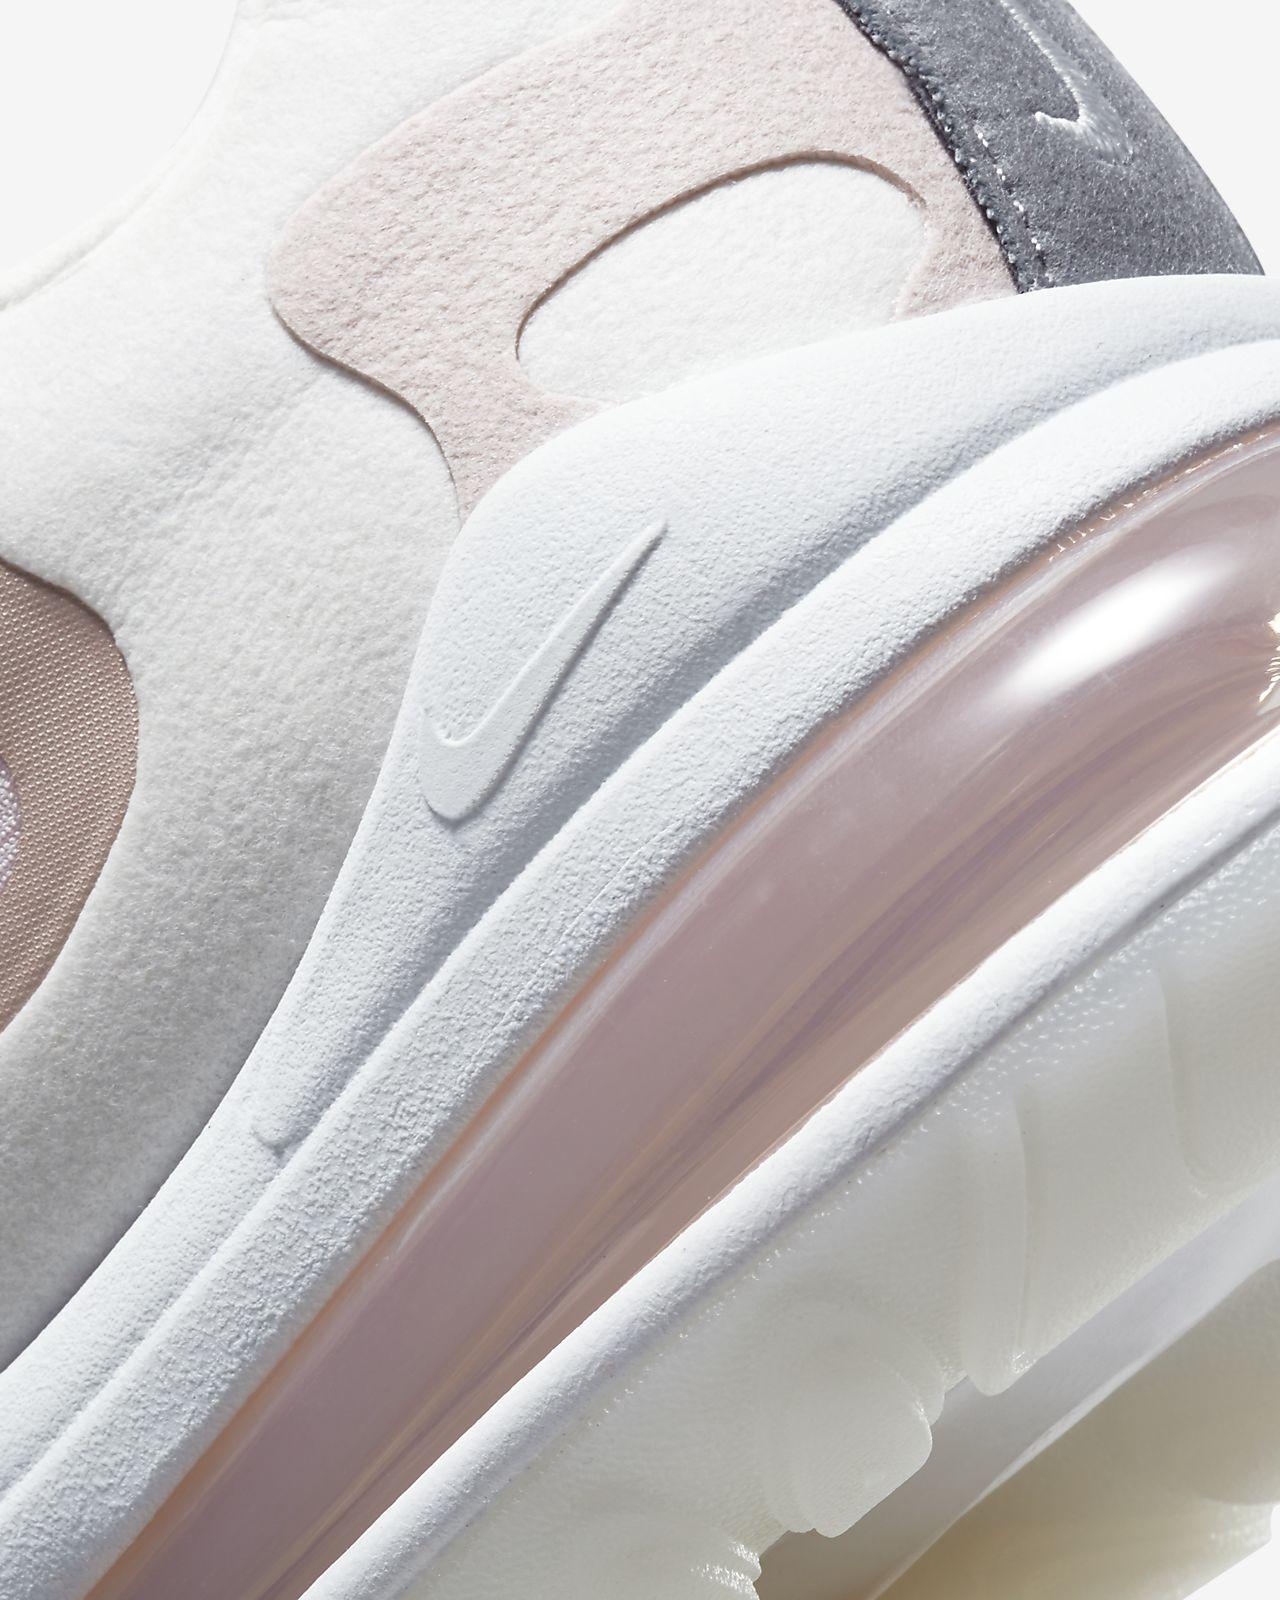 Nike Air Max 270 React Plum Chalk Stone Mauve (w) in White